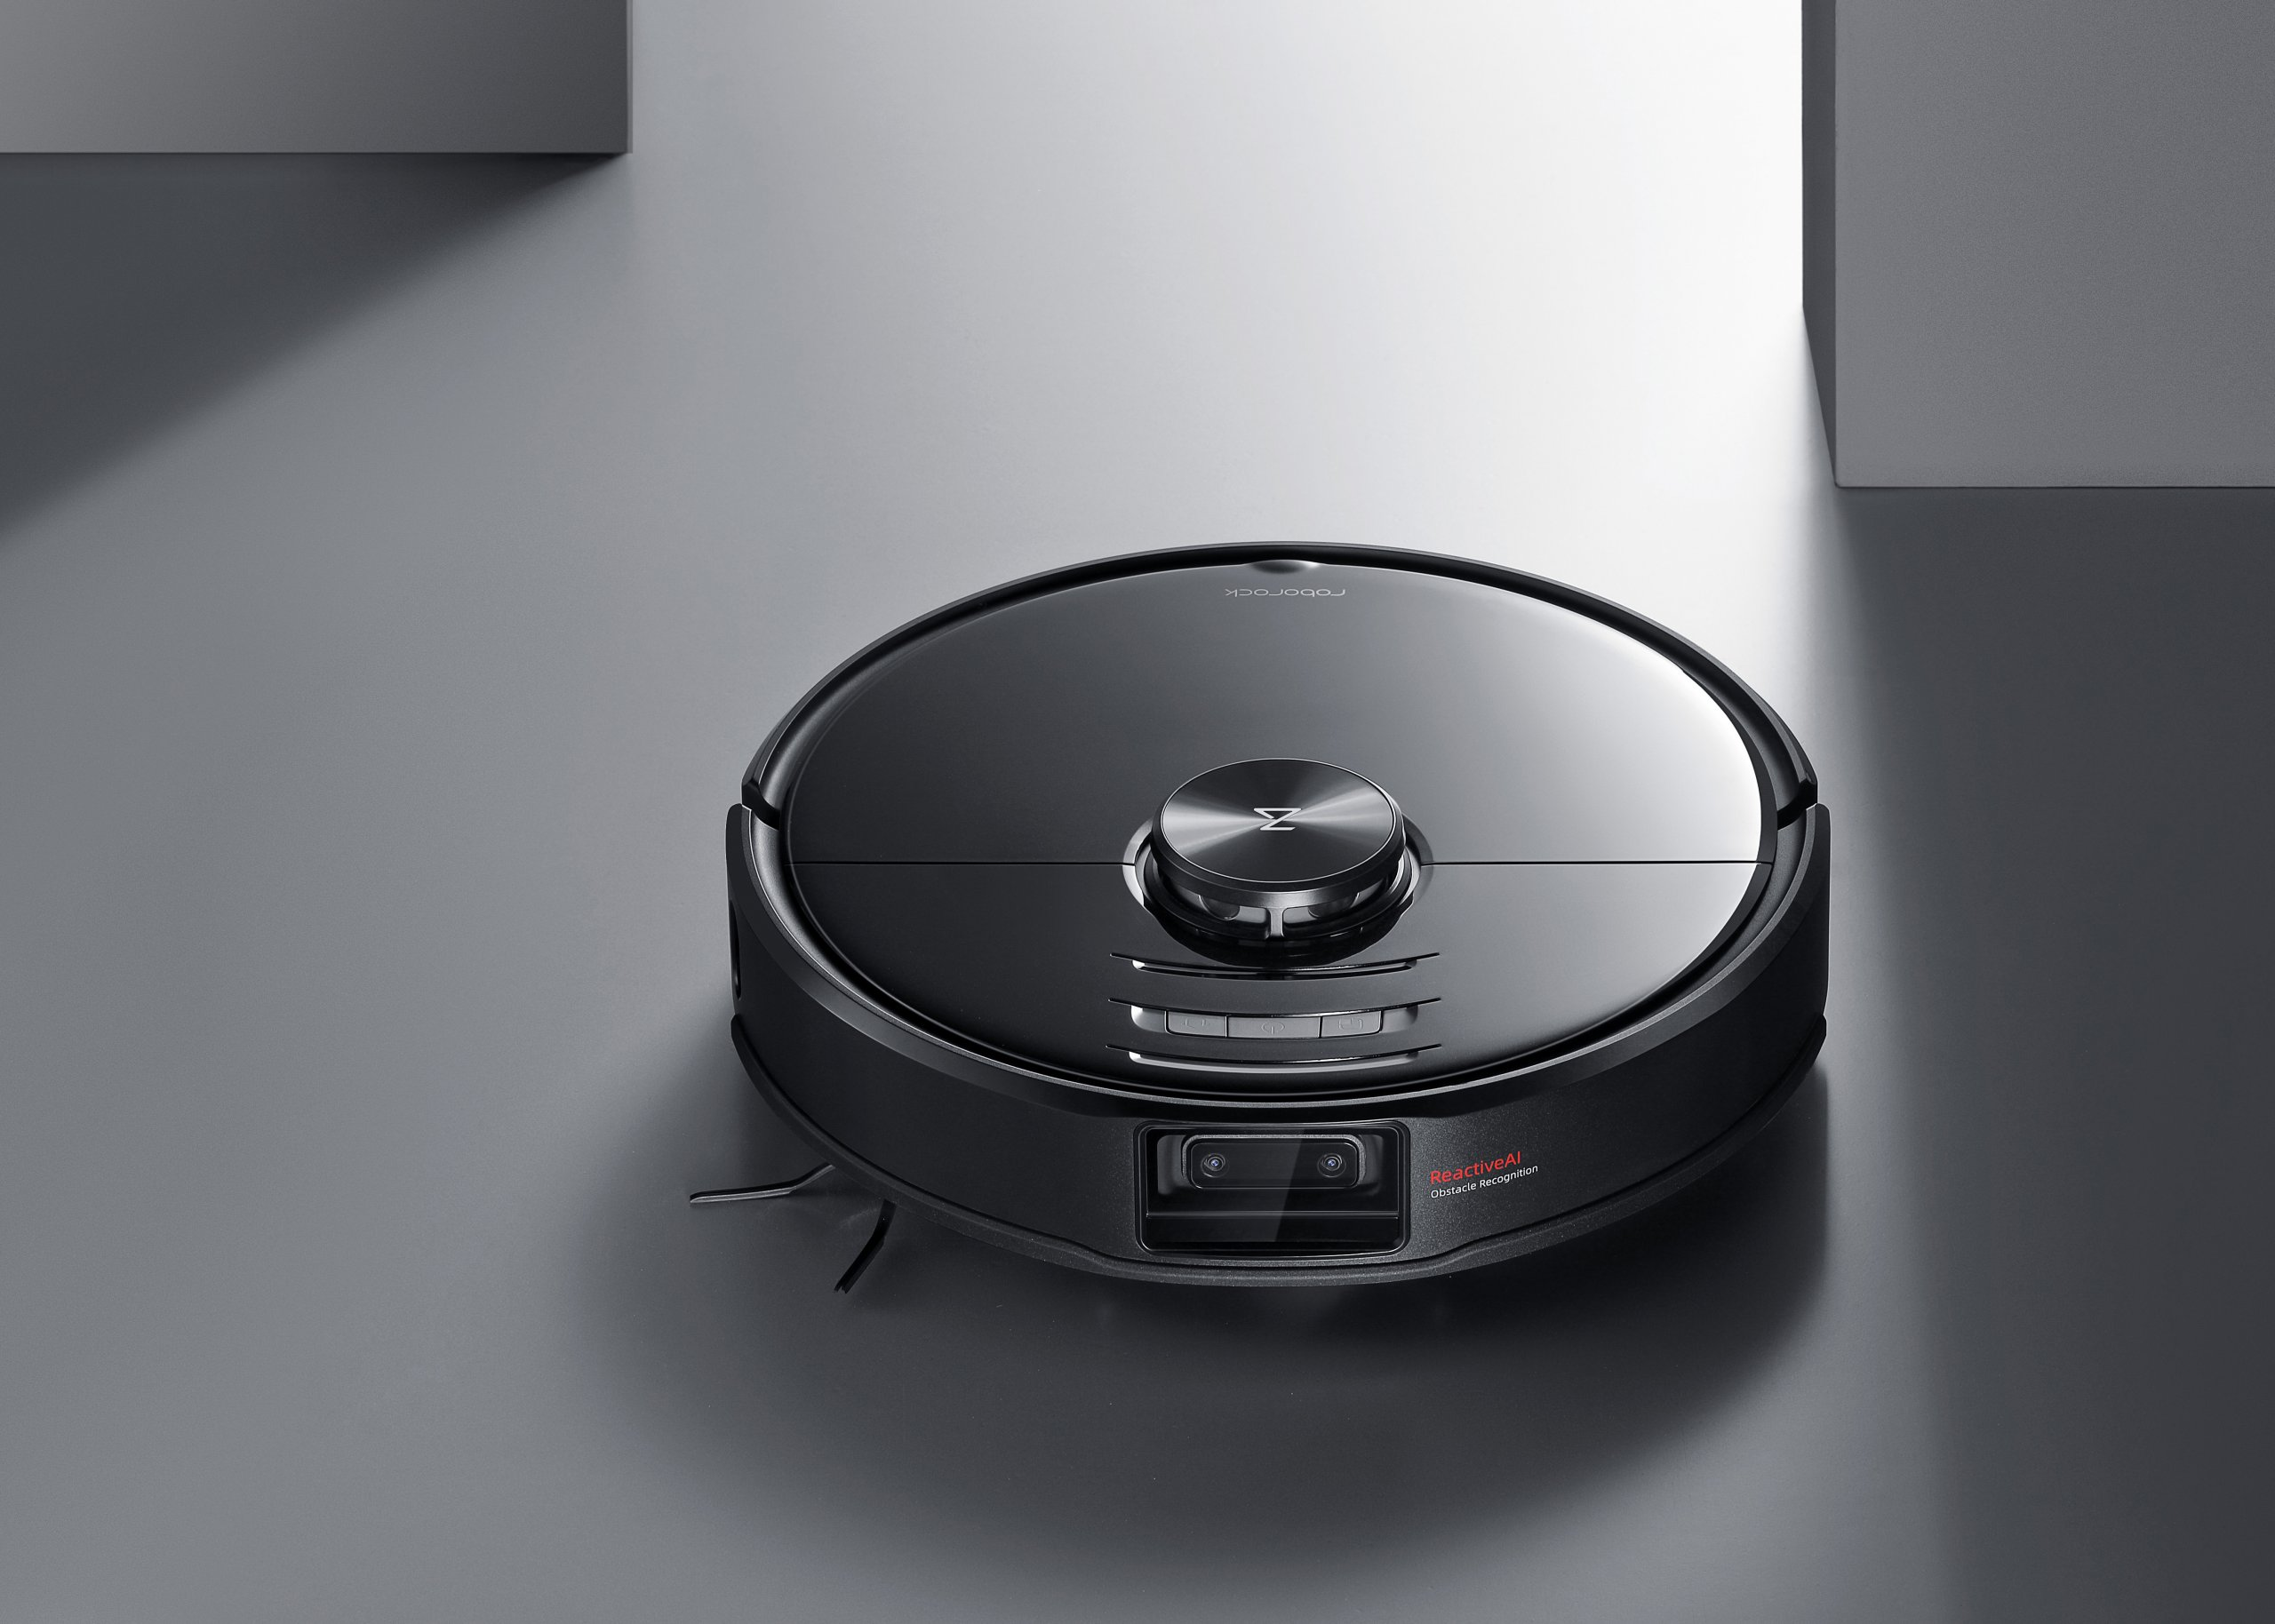 Roborock S6 MaxV Stereo-Kamera